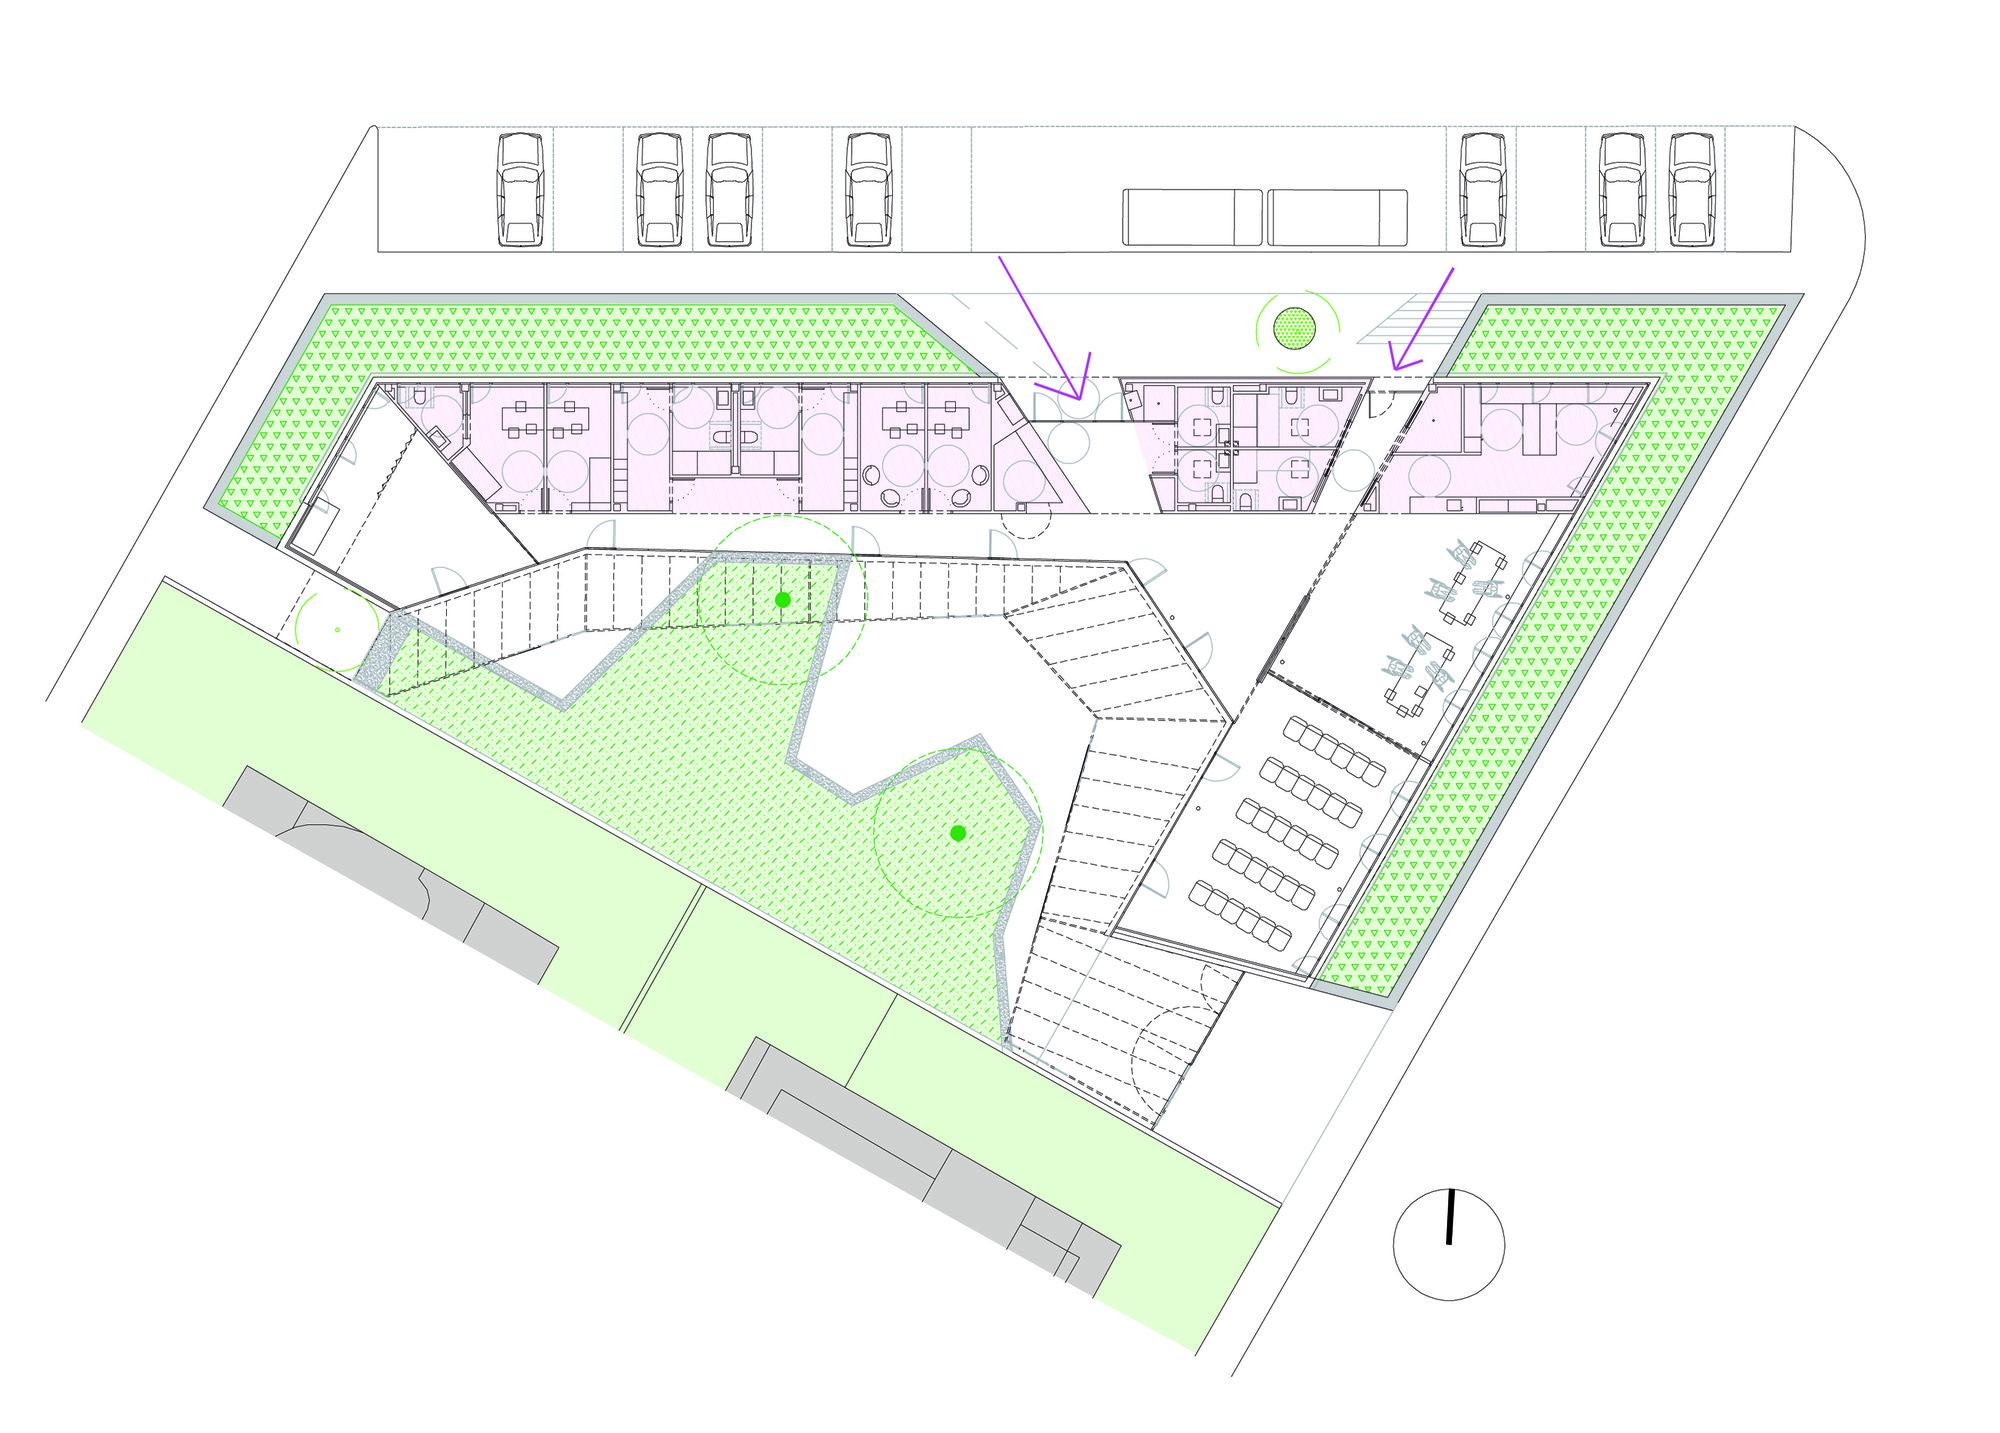 Centro de d a flexo arquitectura plataforma arquitectura for Plantas de arquitectura